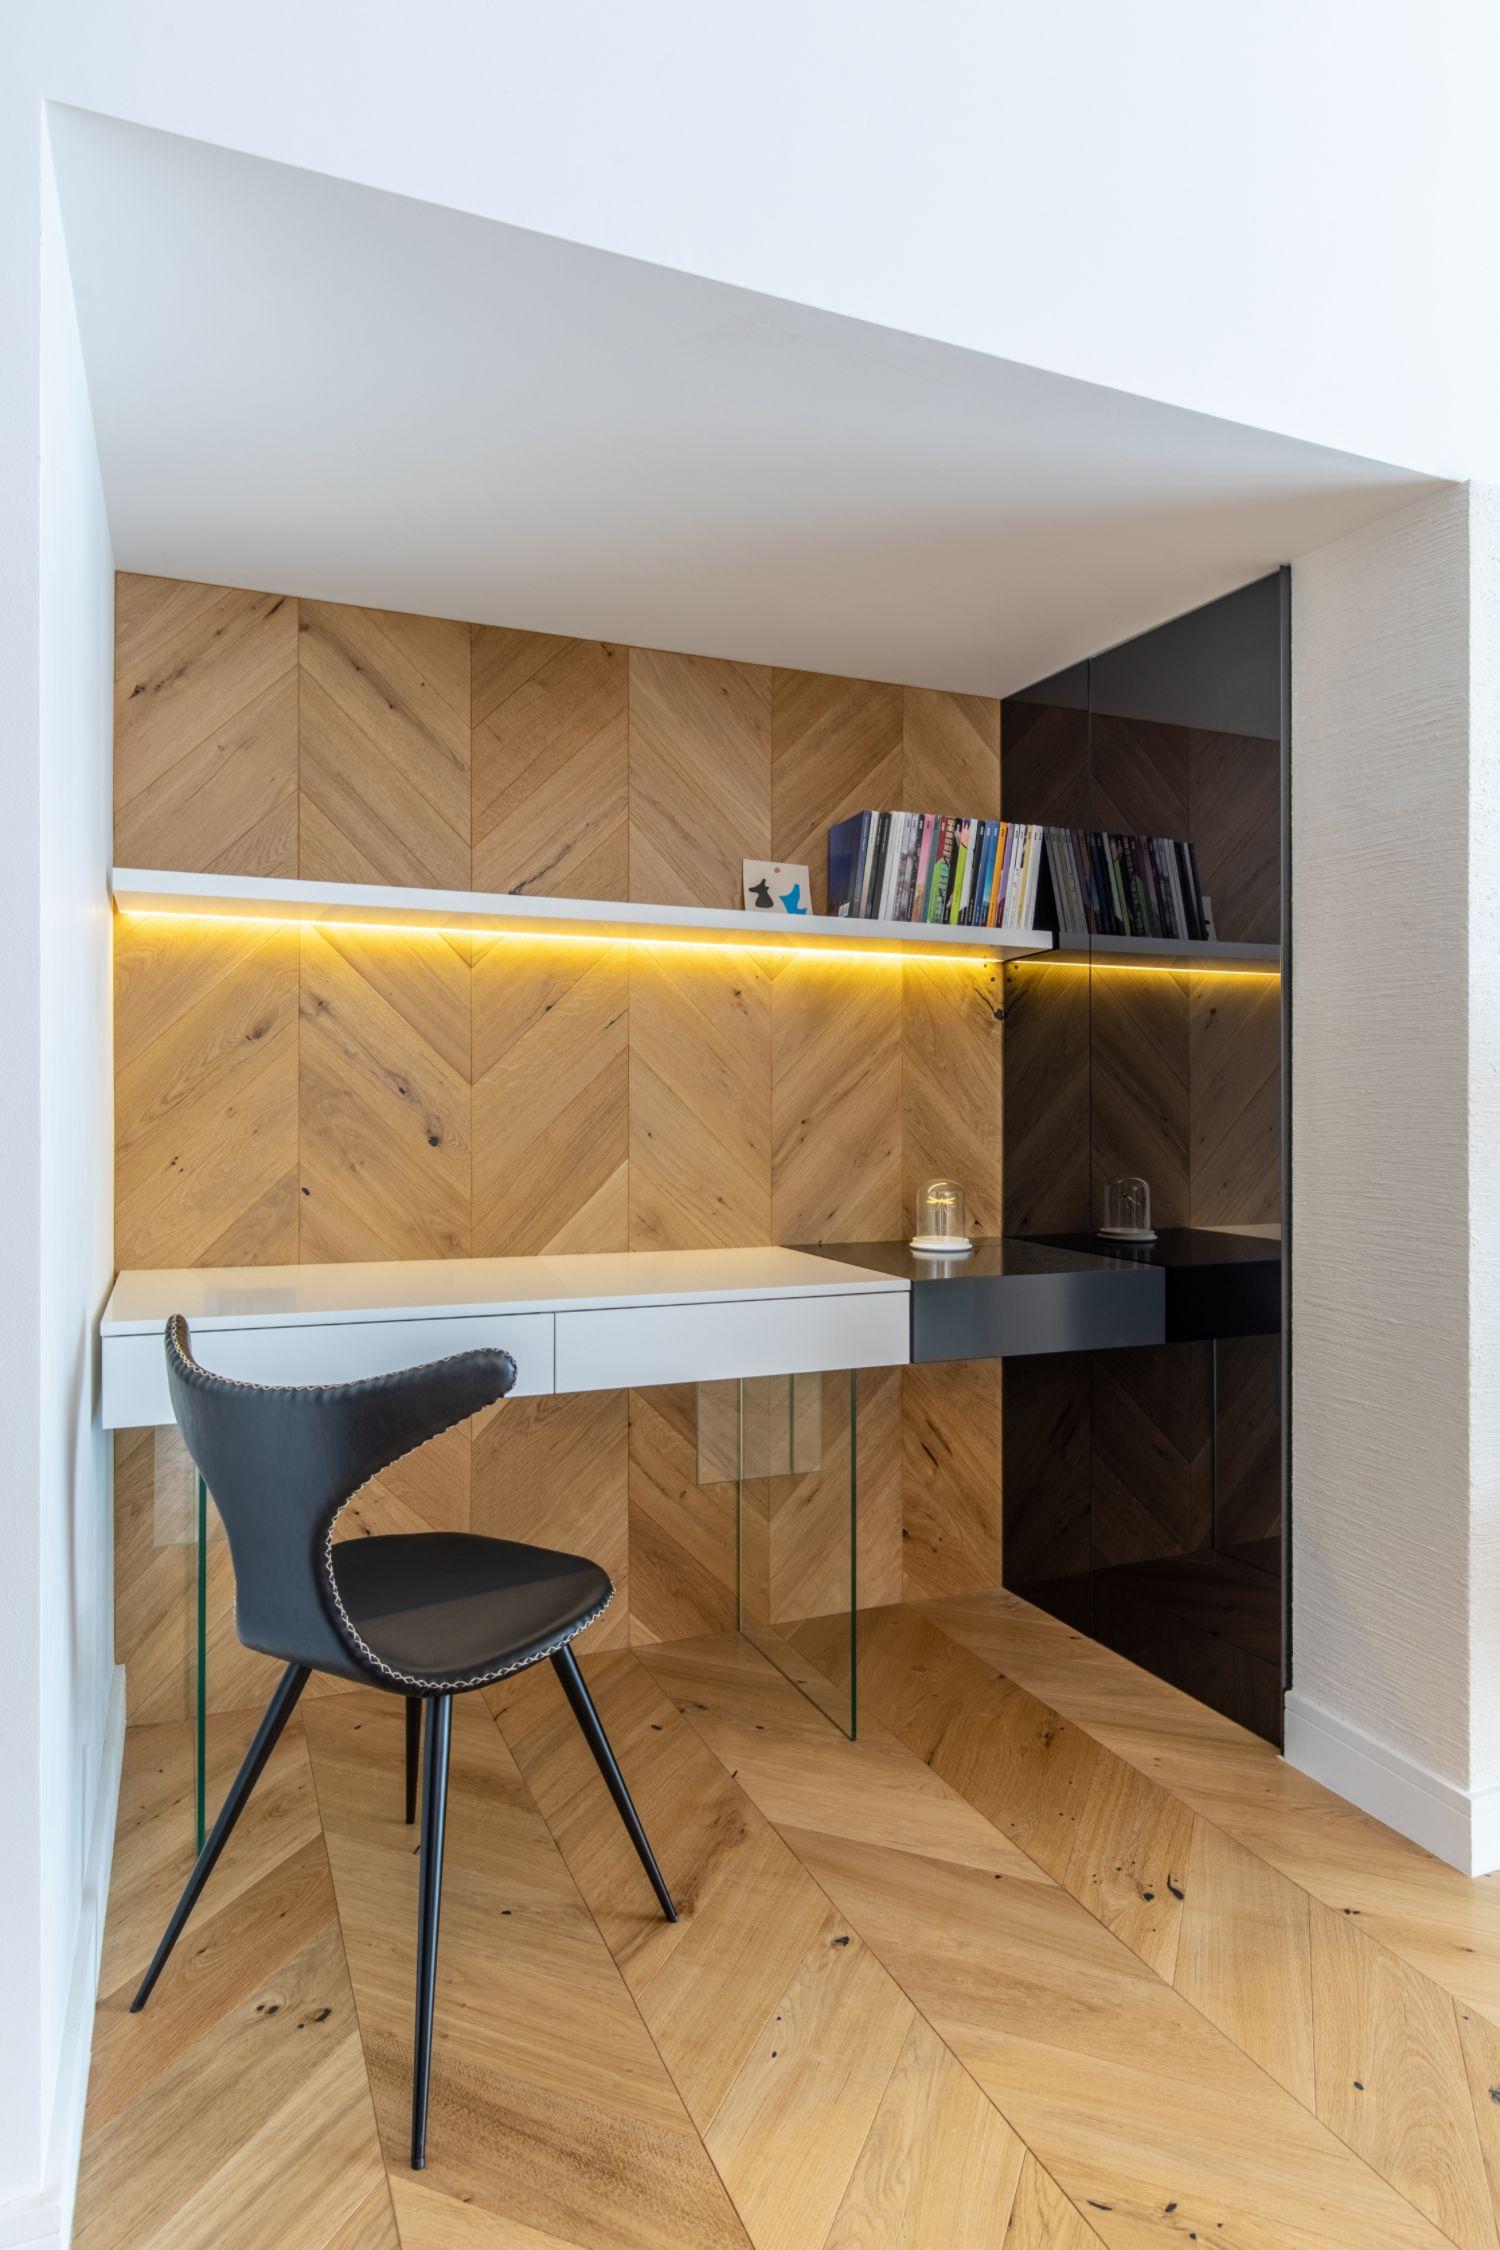 Amenajare vila duplex Otopeni stil eclectic - Sergiu Califar - Pure Mess Design - birou sub scara parchet tip Chevron